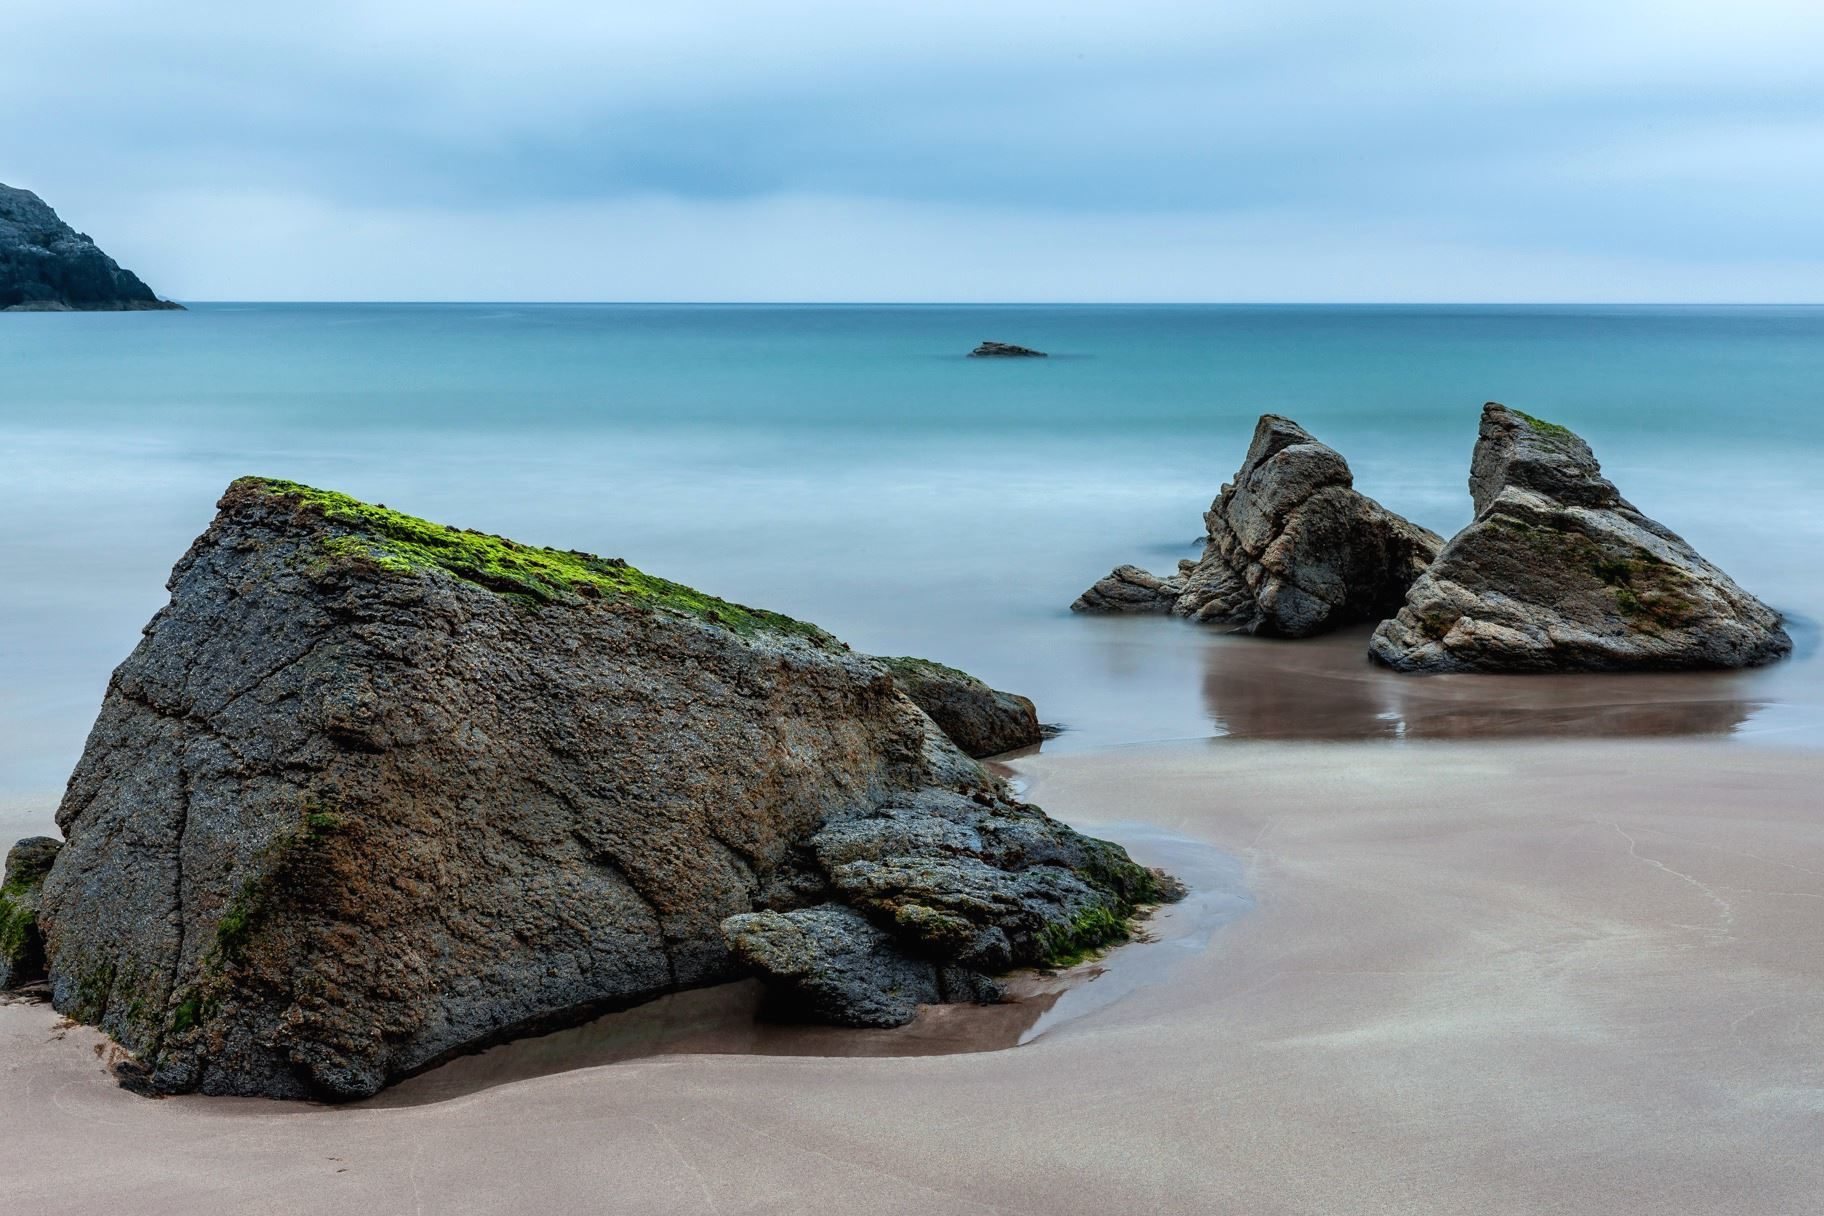 En la playa 07 - 4 5